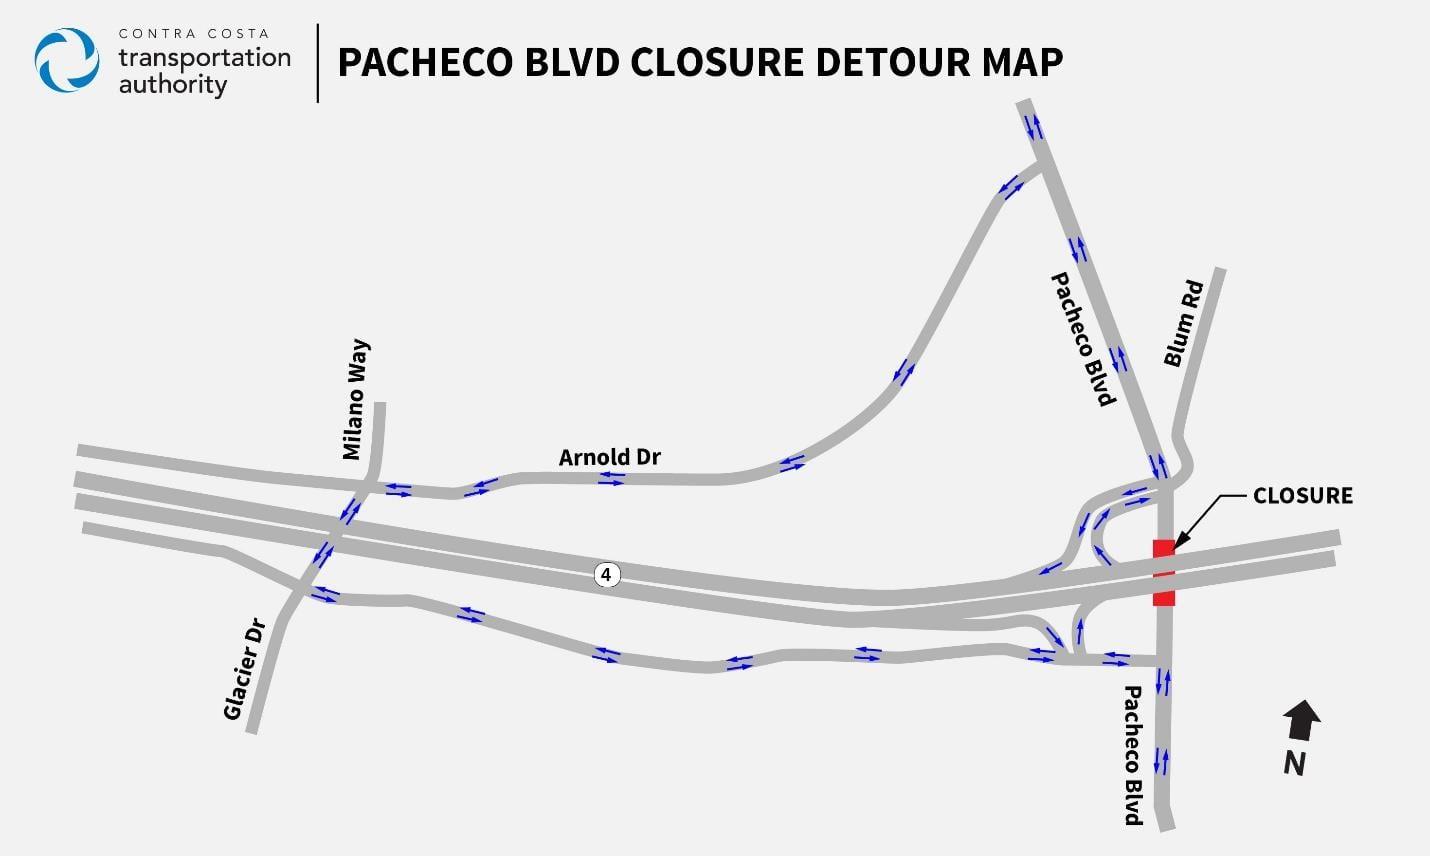 PachecoRd Closure July2019